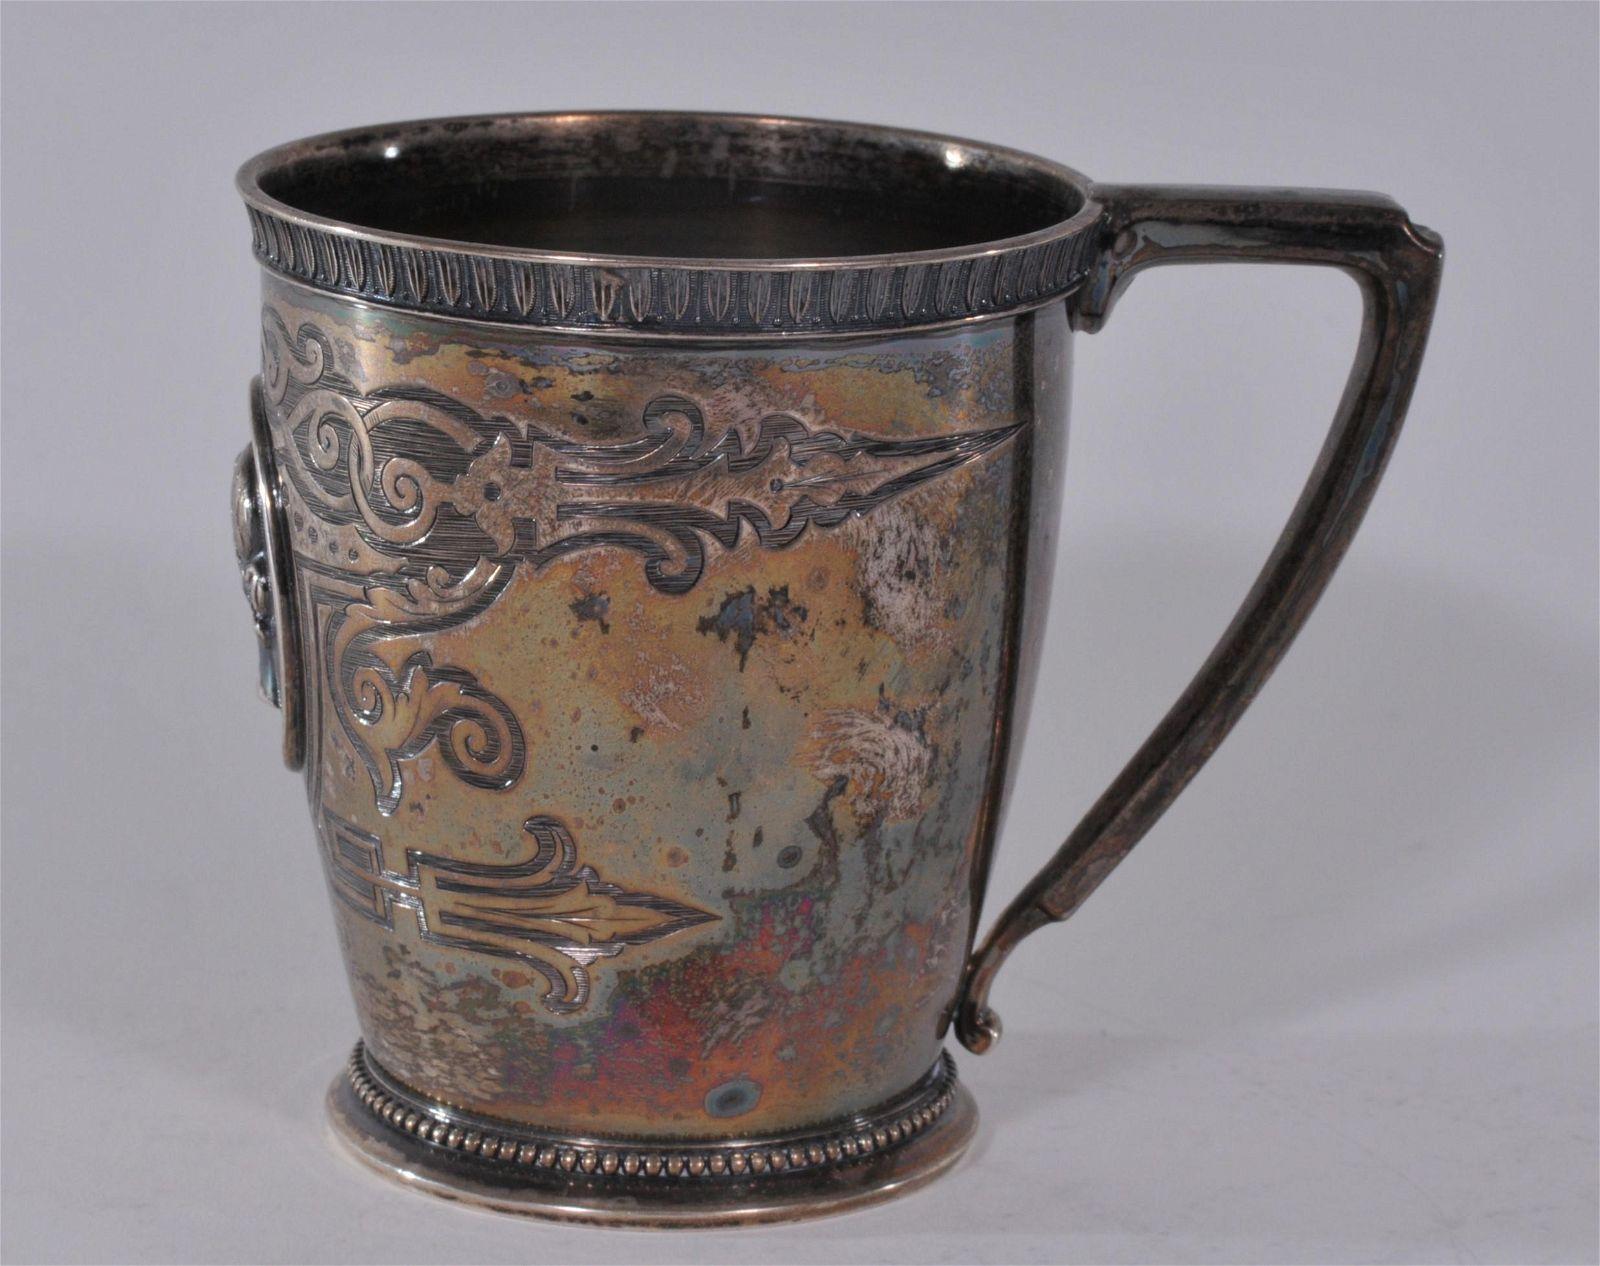 Ball-Black & Co. N.Y. sterling silver Victorian